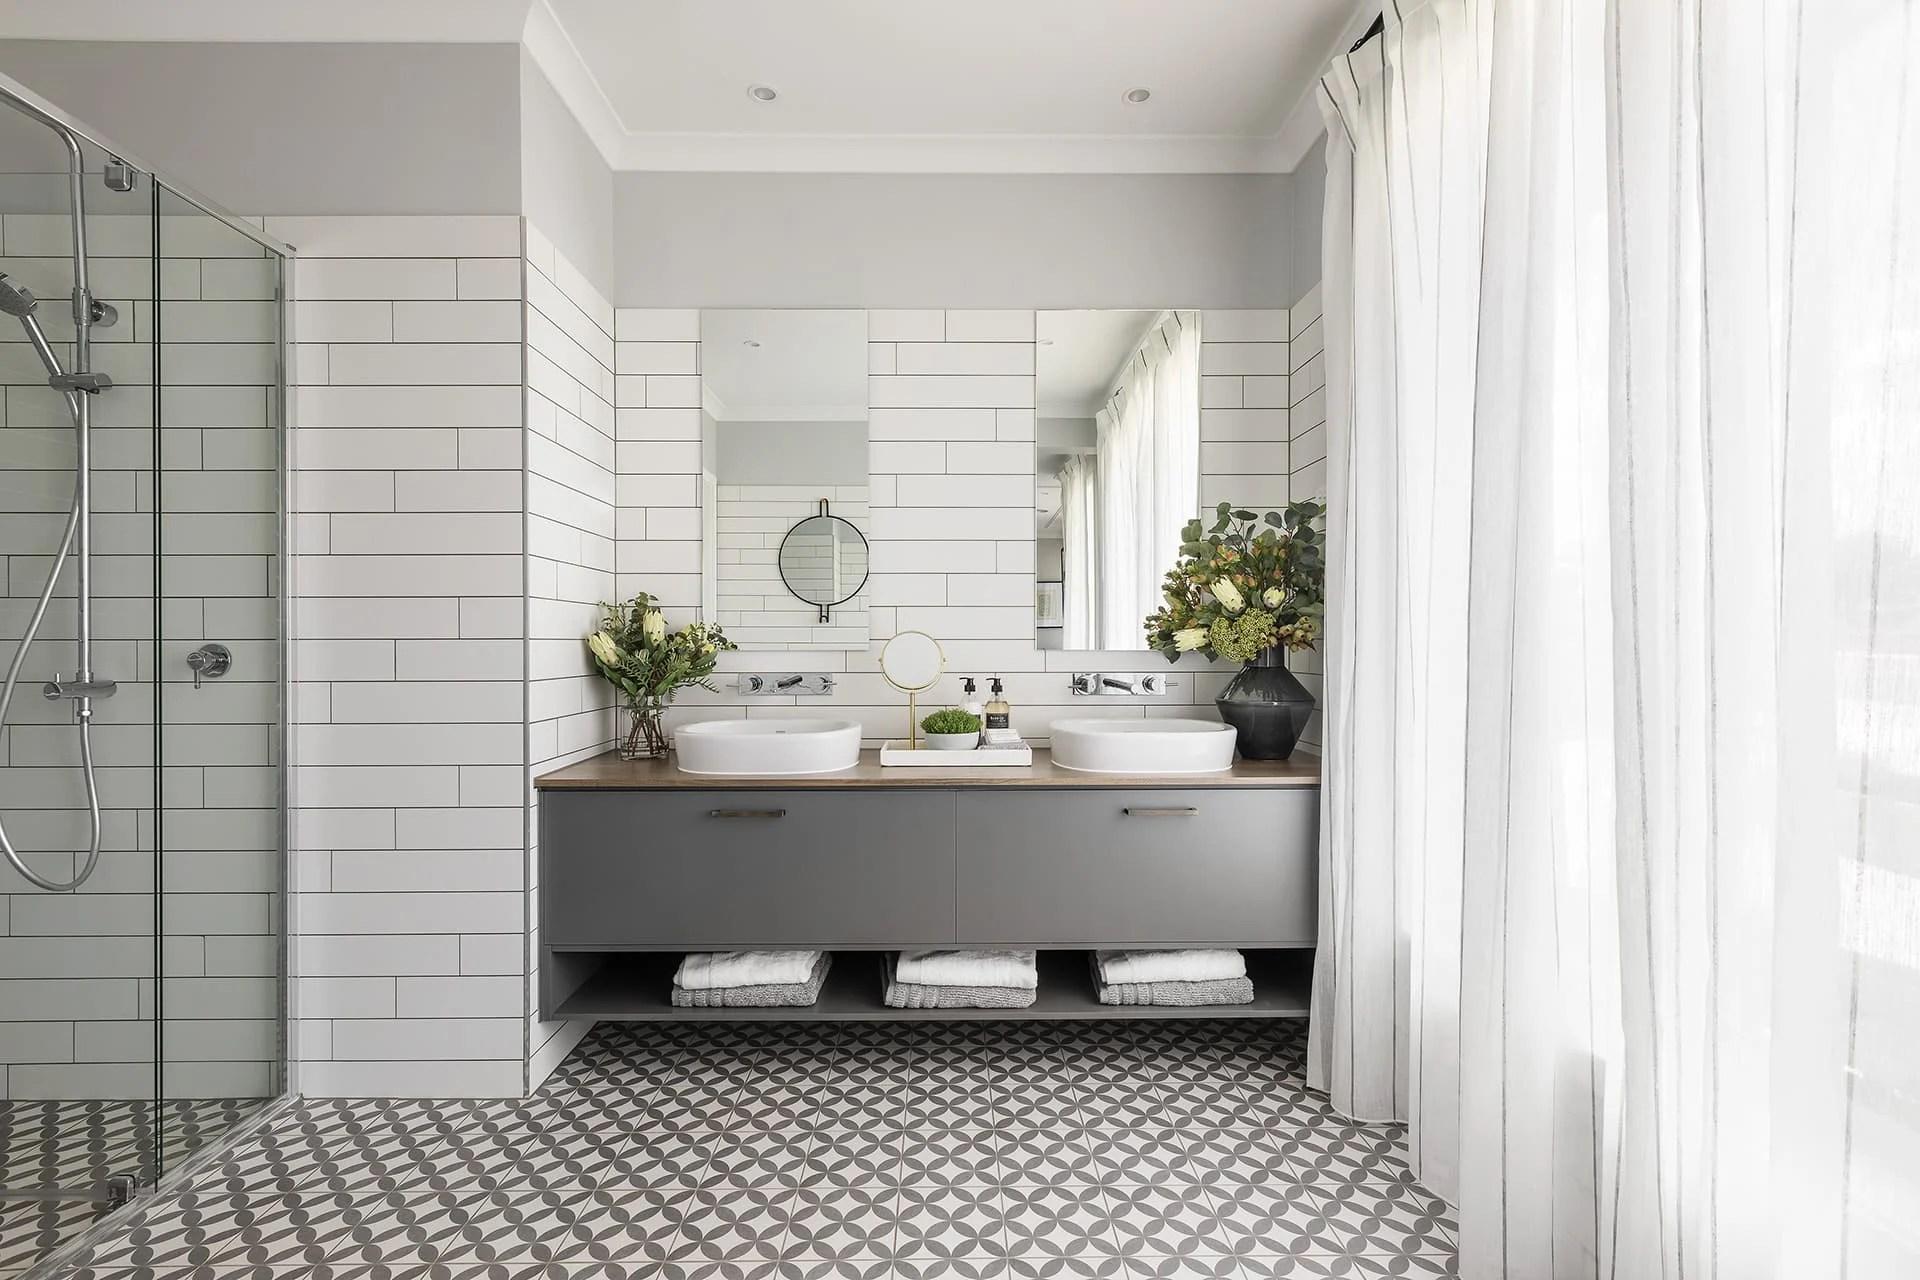 Modern Country Interior Design Ideas - TLC Interiors on Rural Bathroom  id=59847